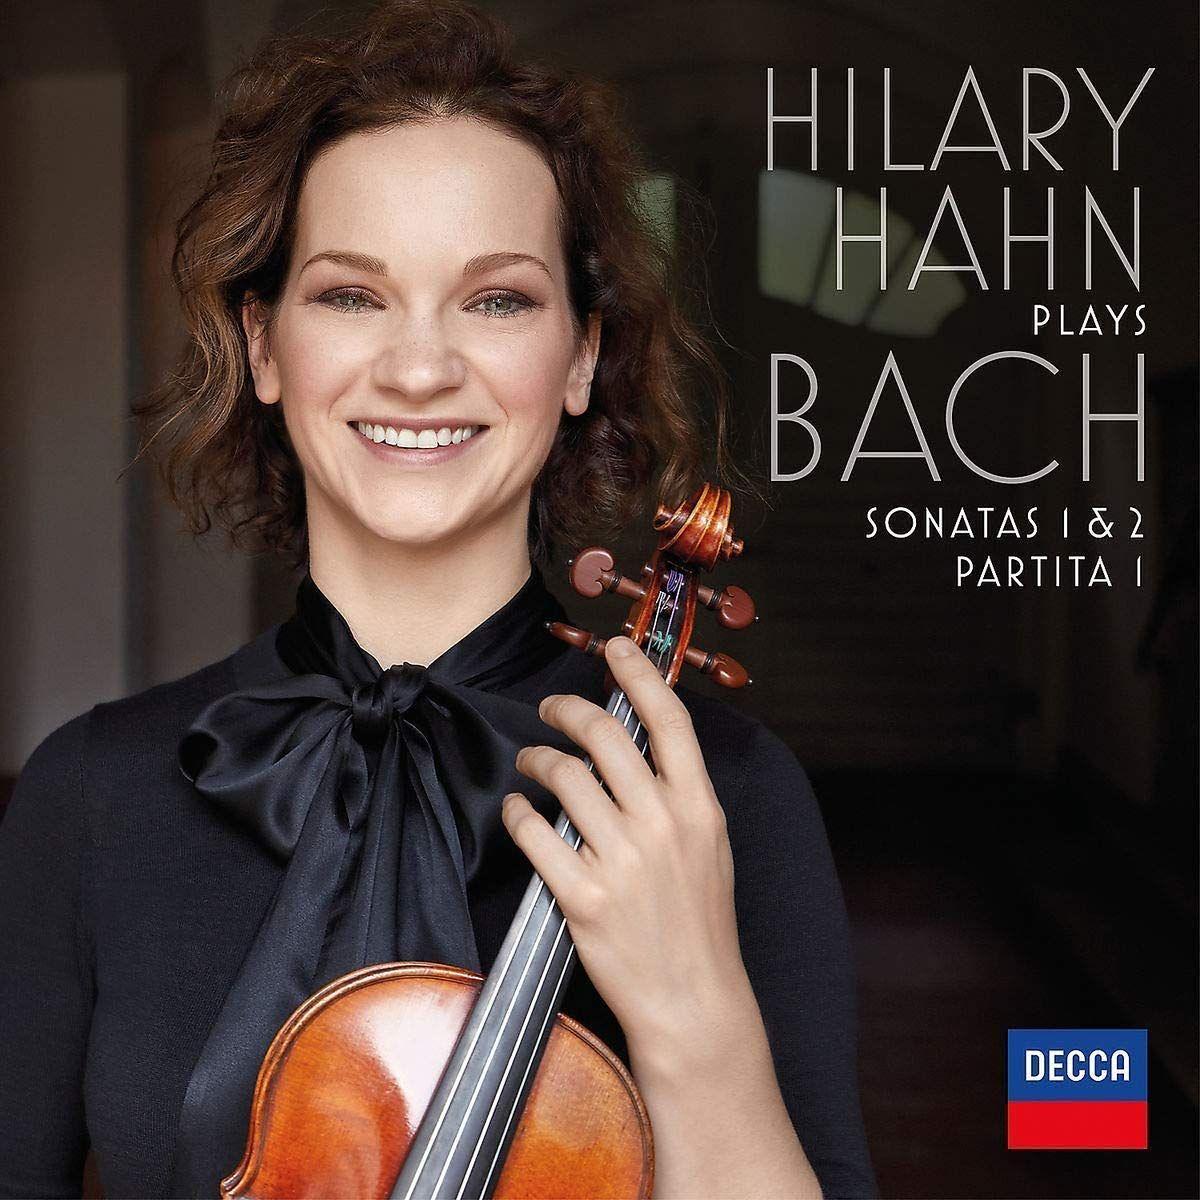 цена на Хилари Хан Hilary Hahn. Bach: Violin Sonatas Nos. 1 & 2; Partita No. 1 (2 LP)